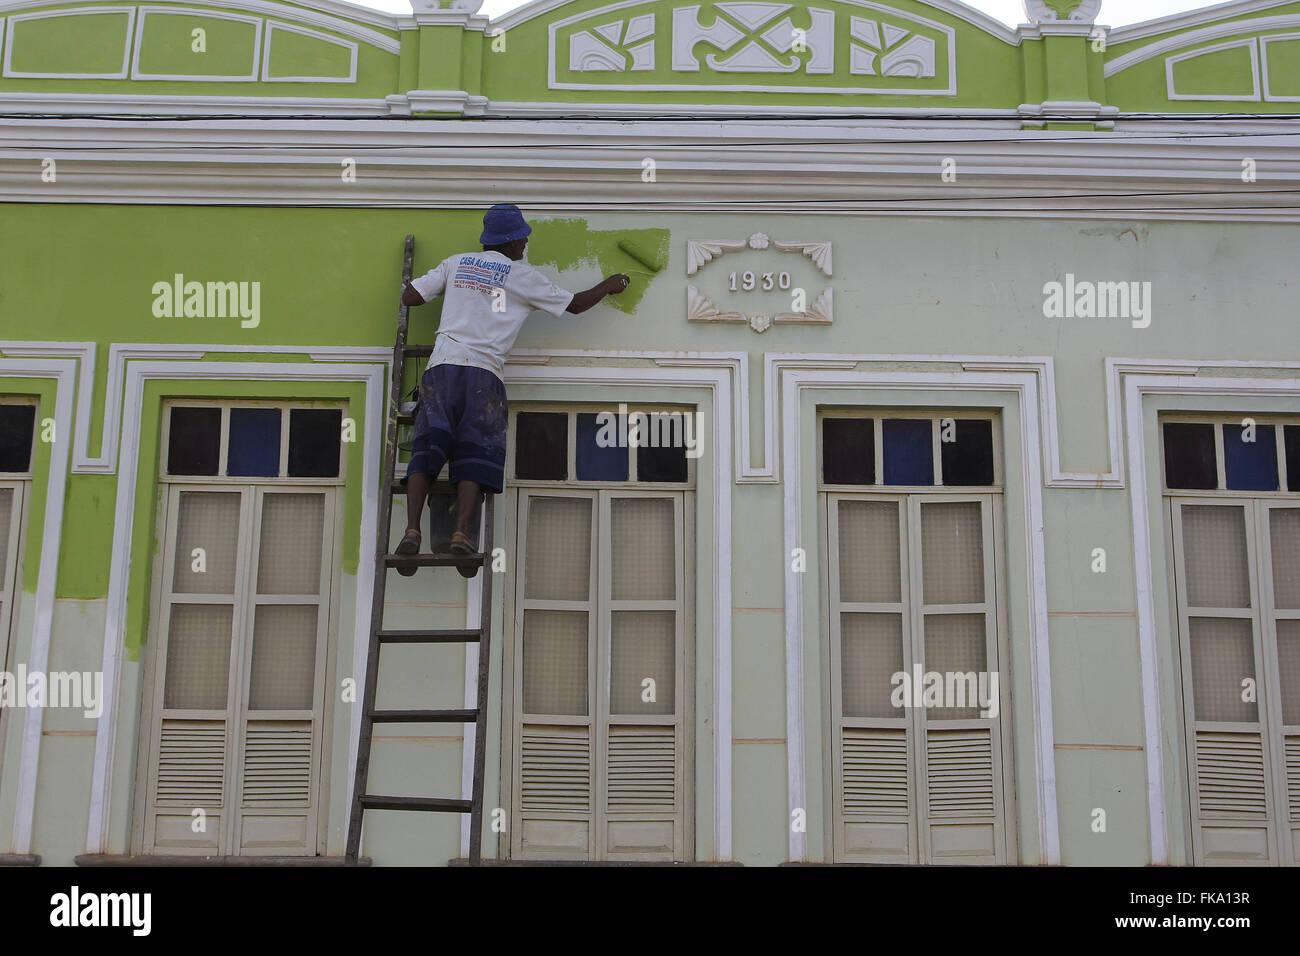 Arbeiter Malerei Fassade des kolonialen townhouse Stockbild